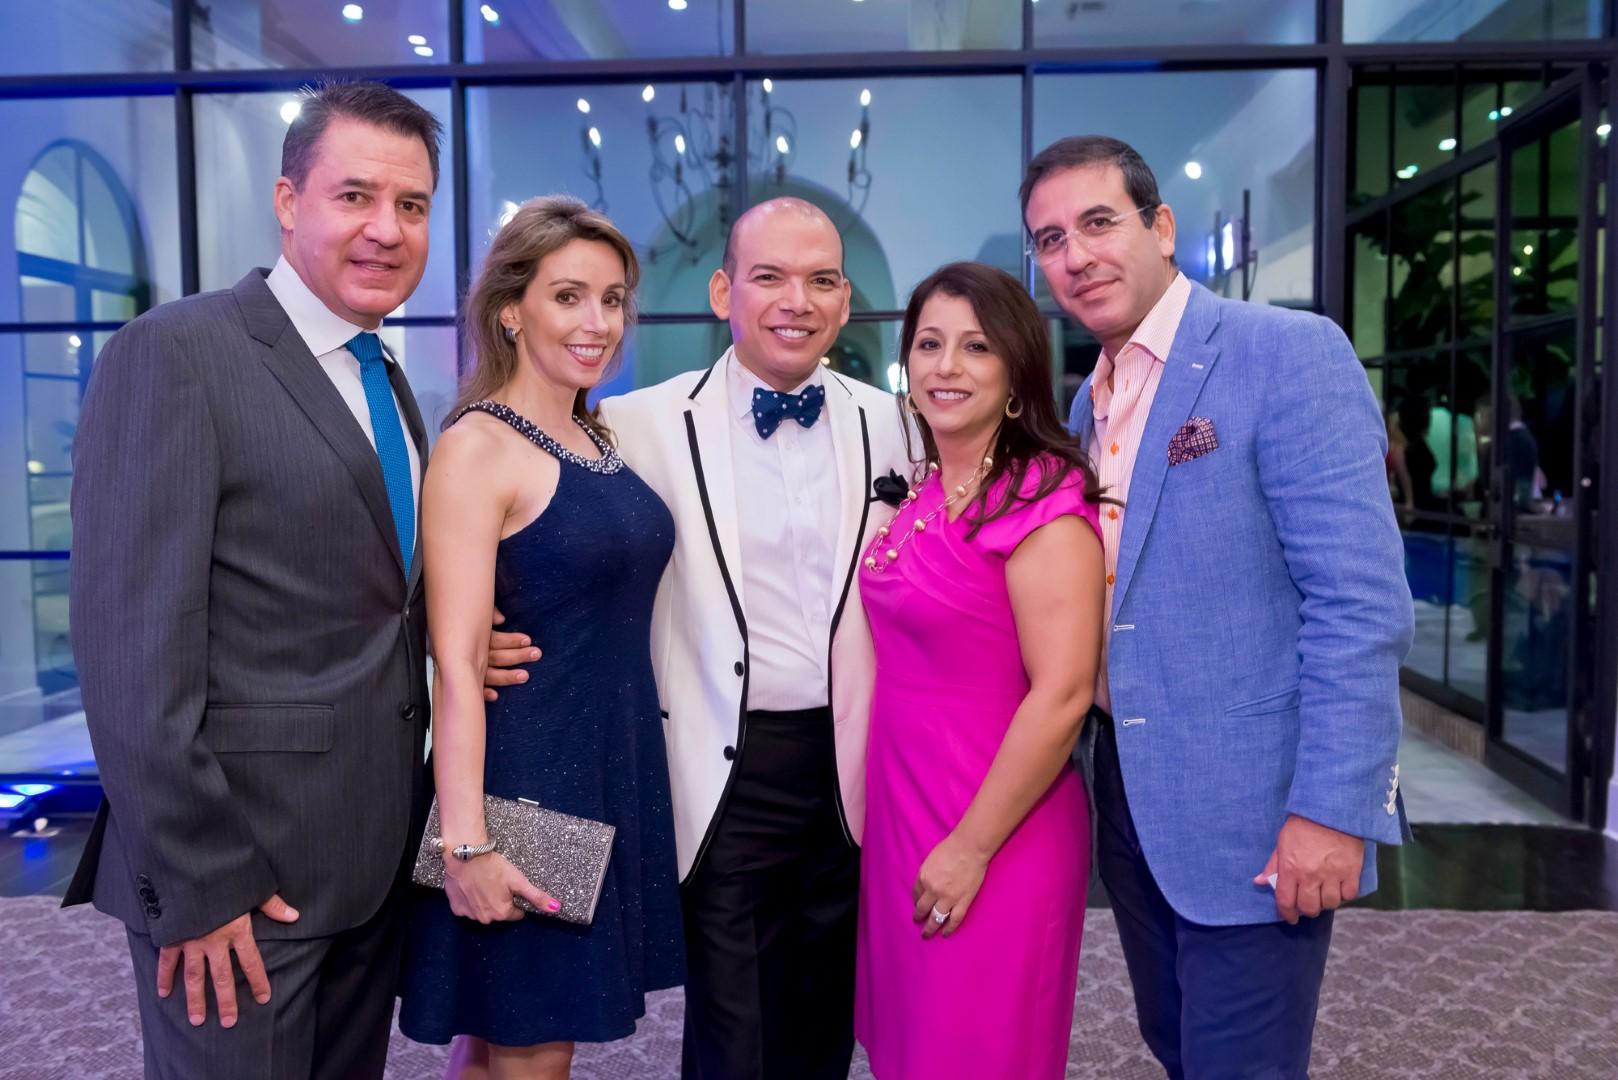 Mauricio Vallejo, Liliana Molina, Alex Martinez-Arpin, Sandra Fonseca, Alberto Uribe